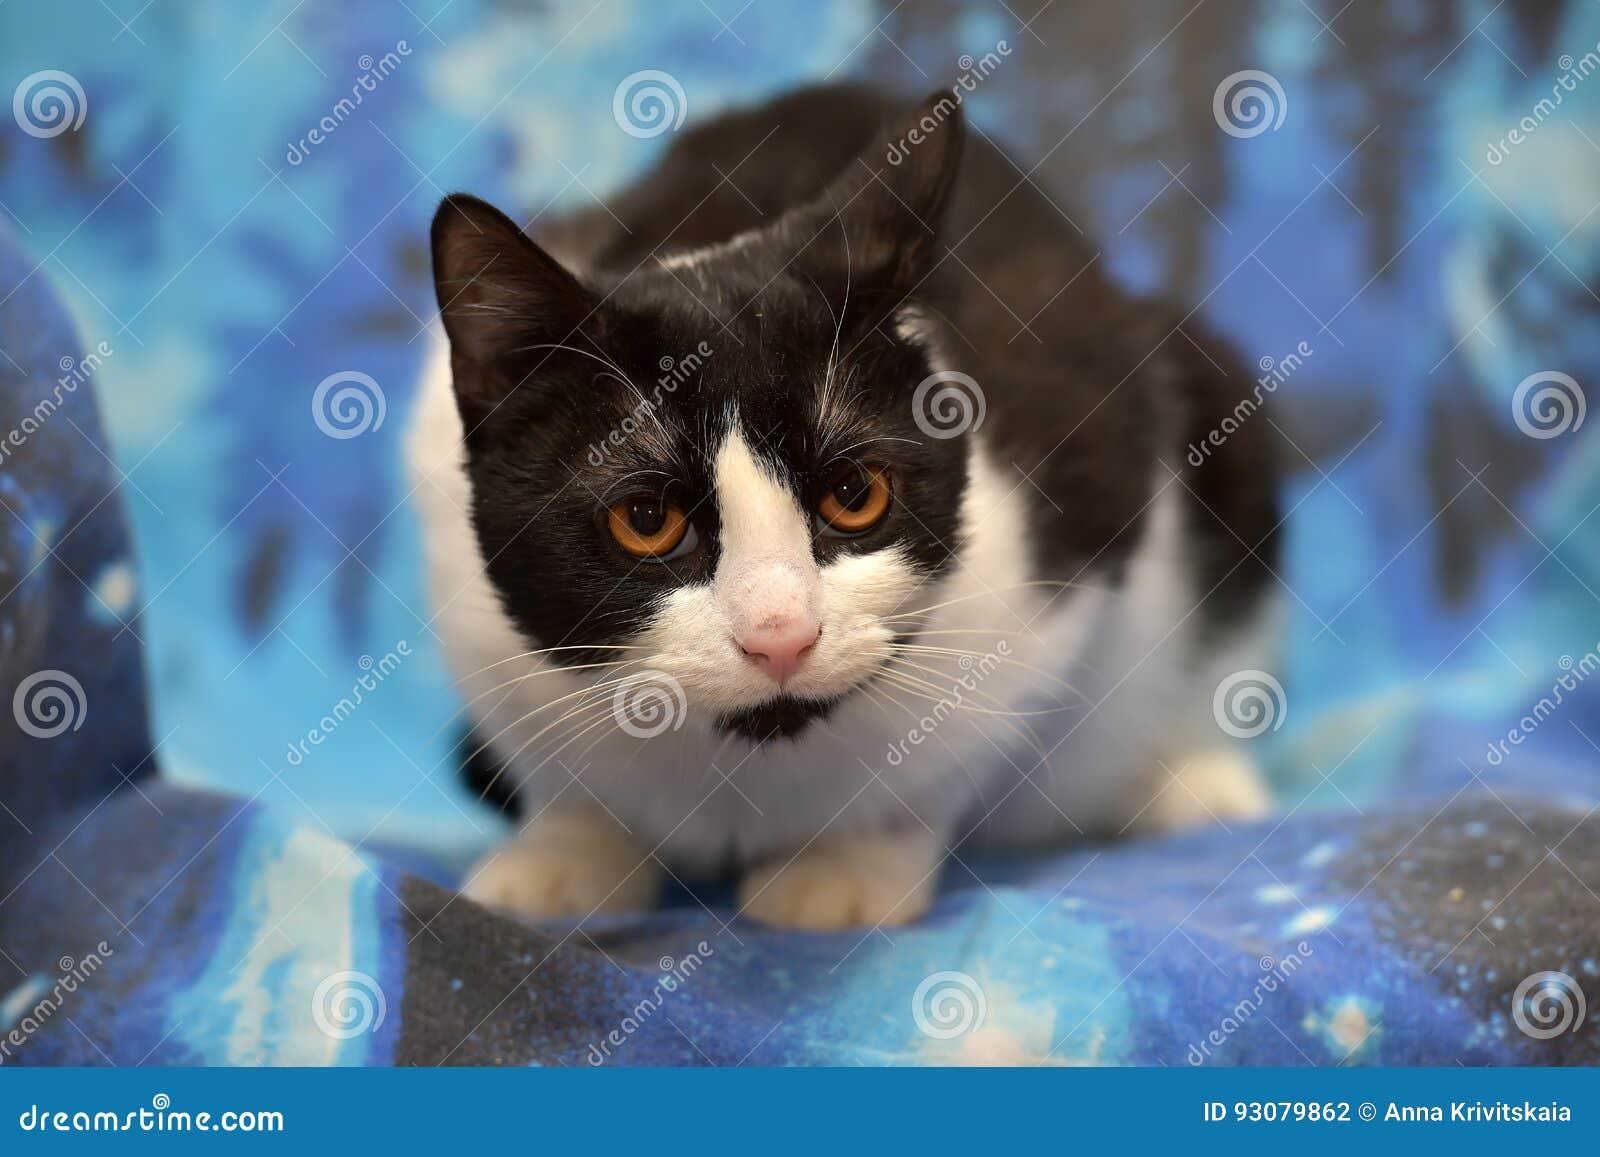 Black With White Short-haired Cat With Orange Eyes Stock Photo ...